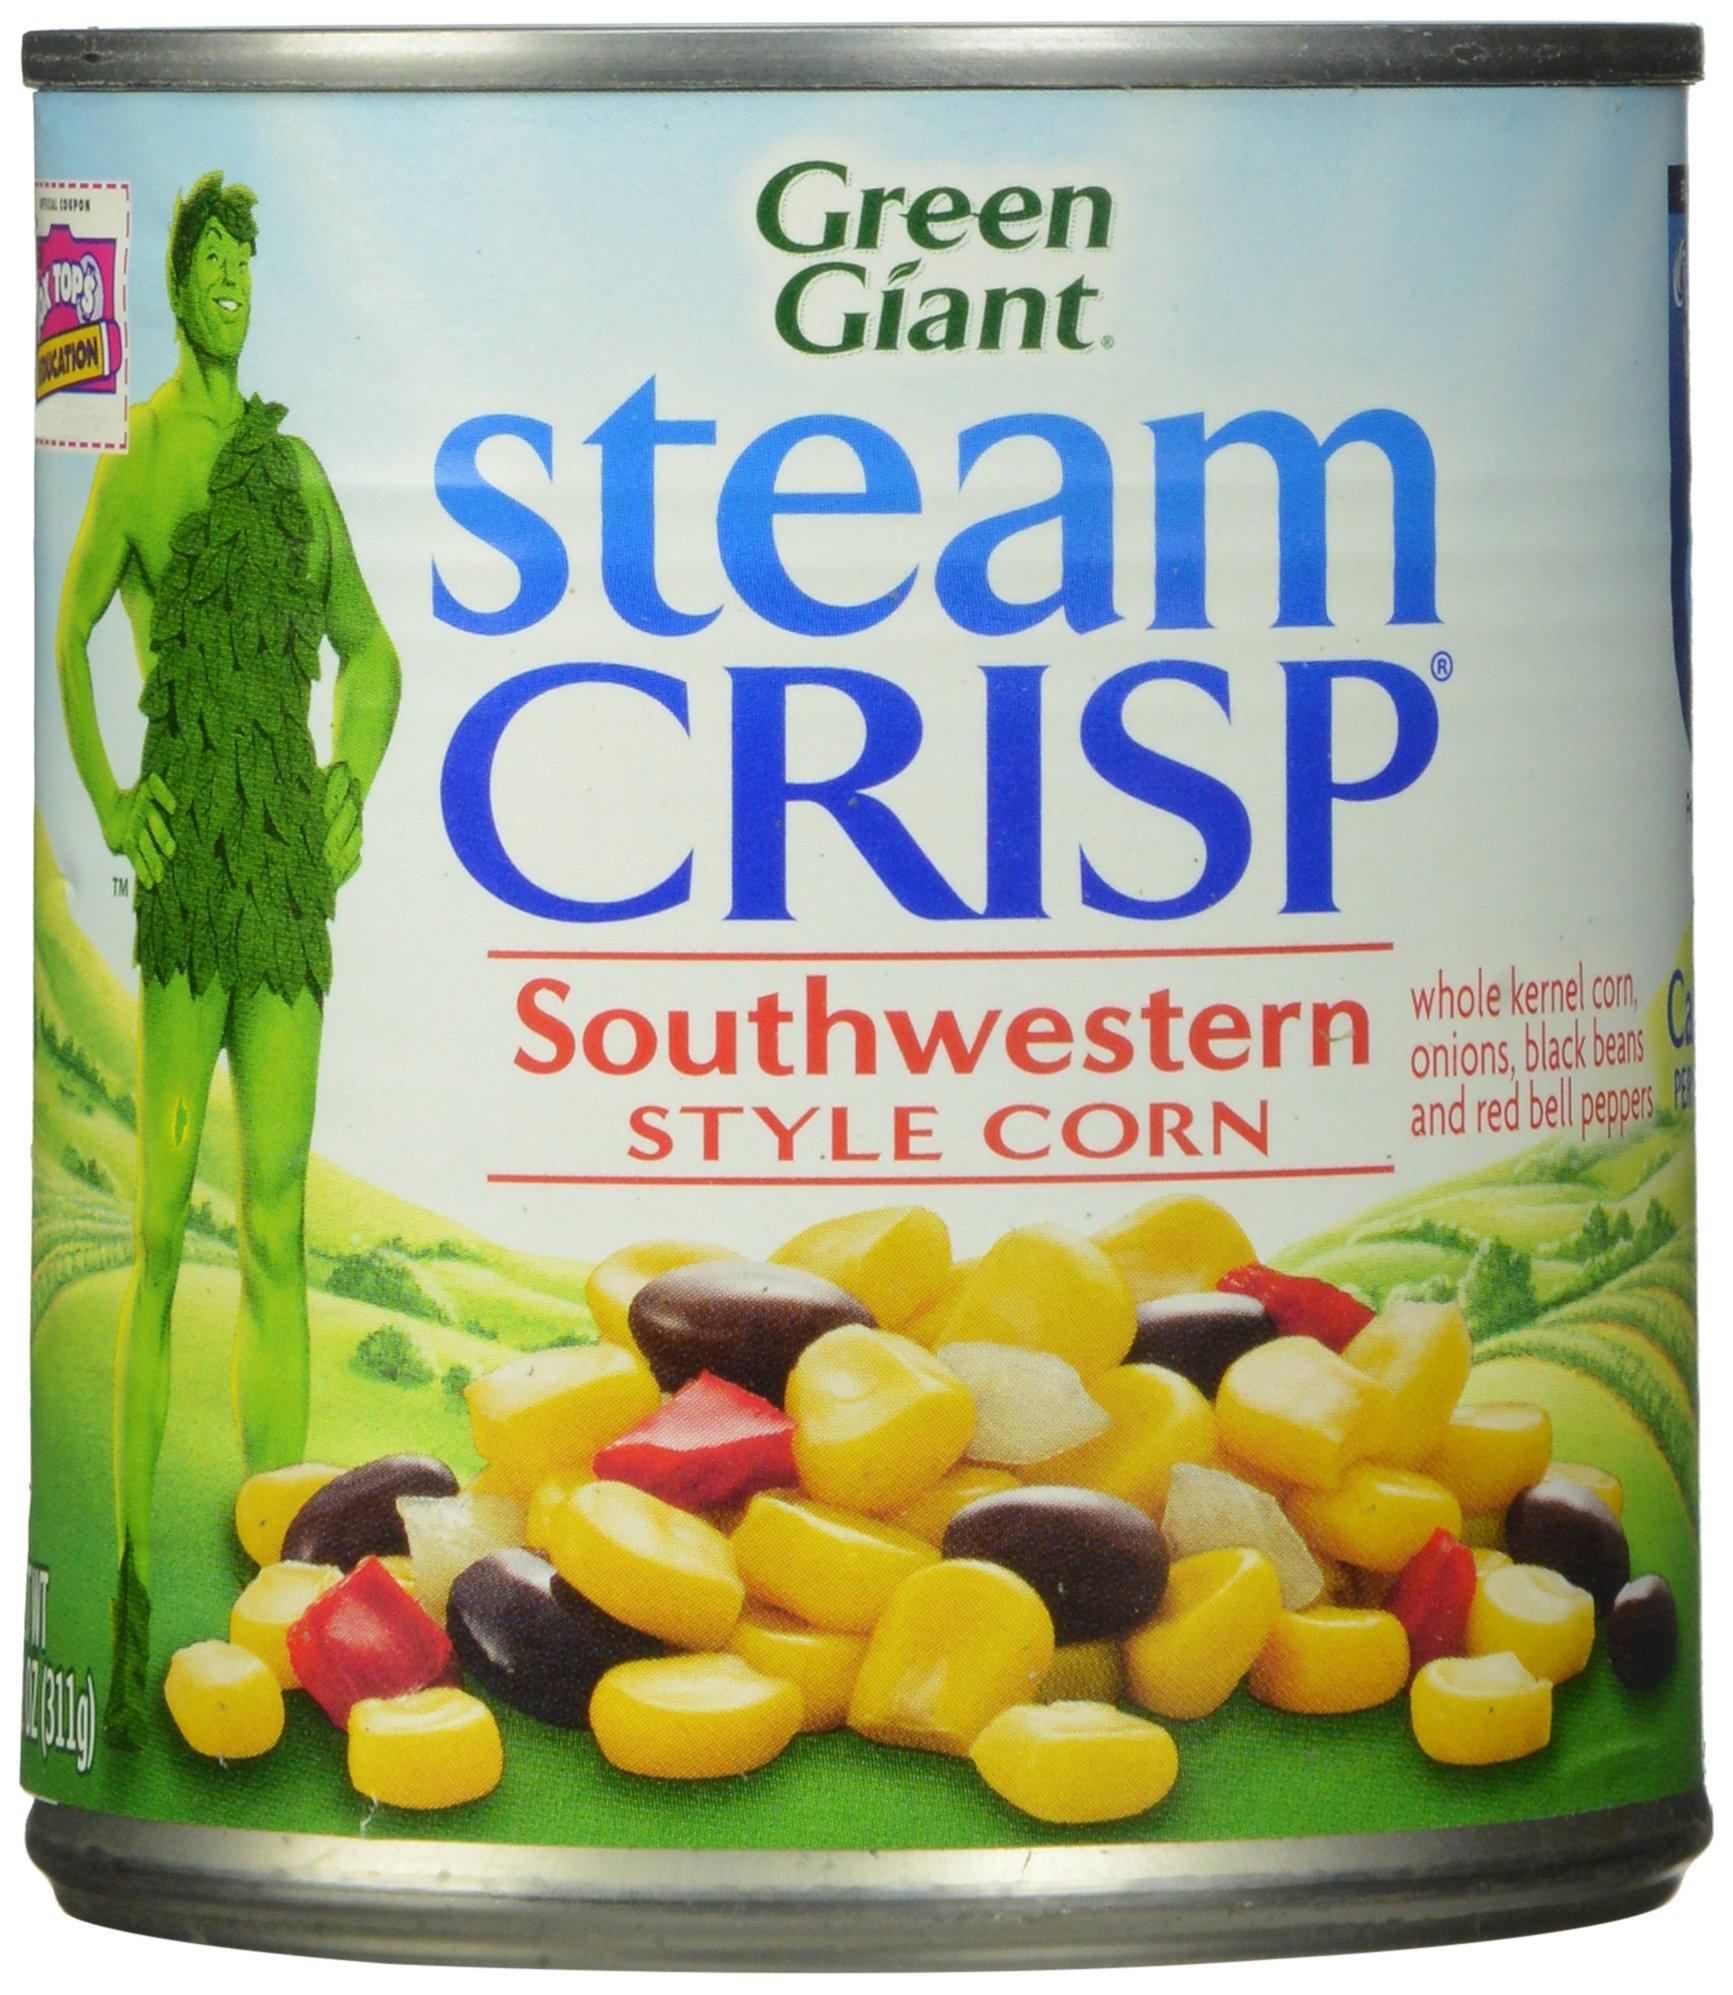 Green Giant Southwestern Style Corn, 11 oz, 12 Pack